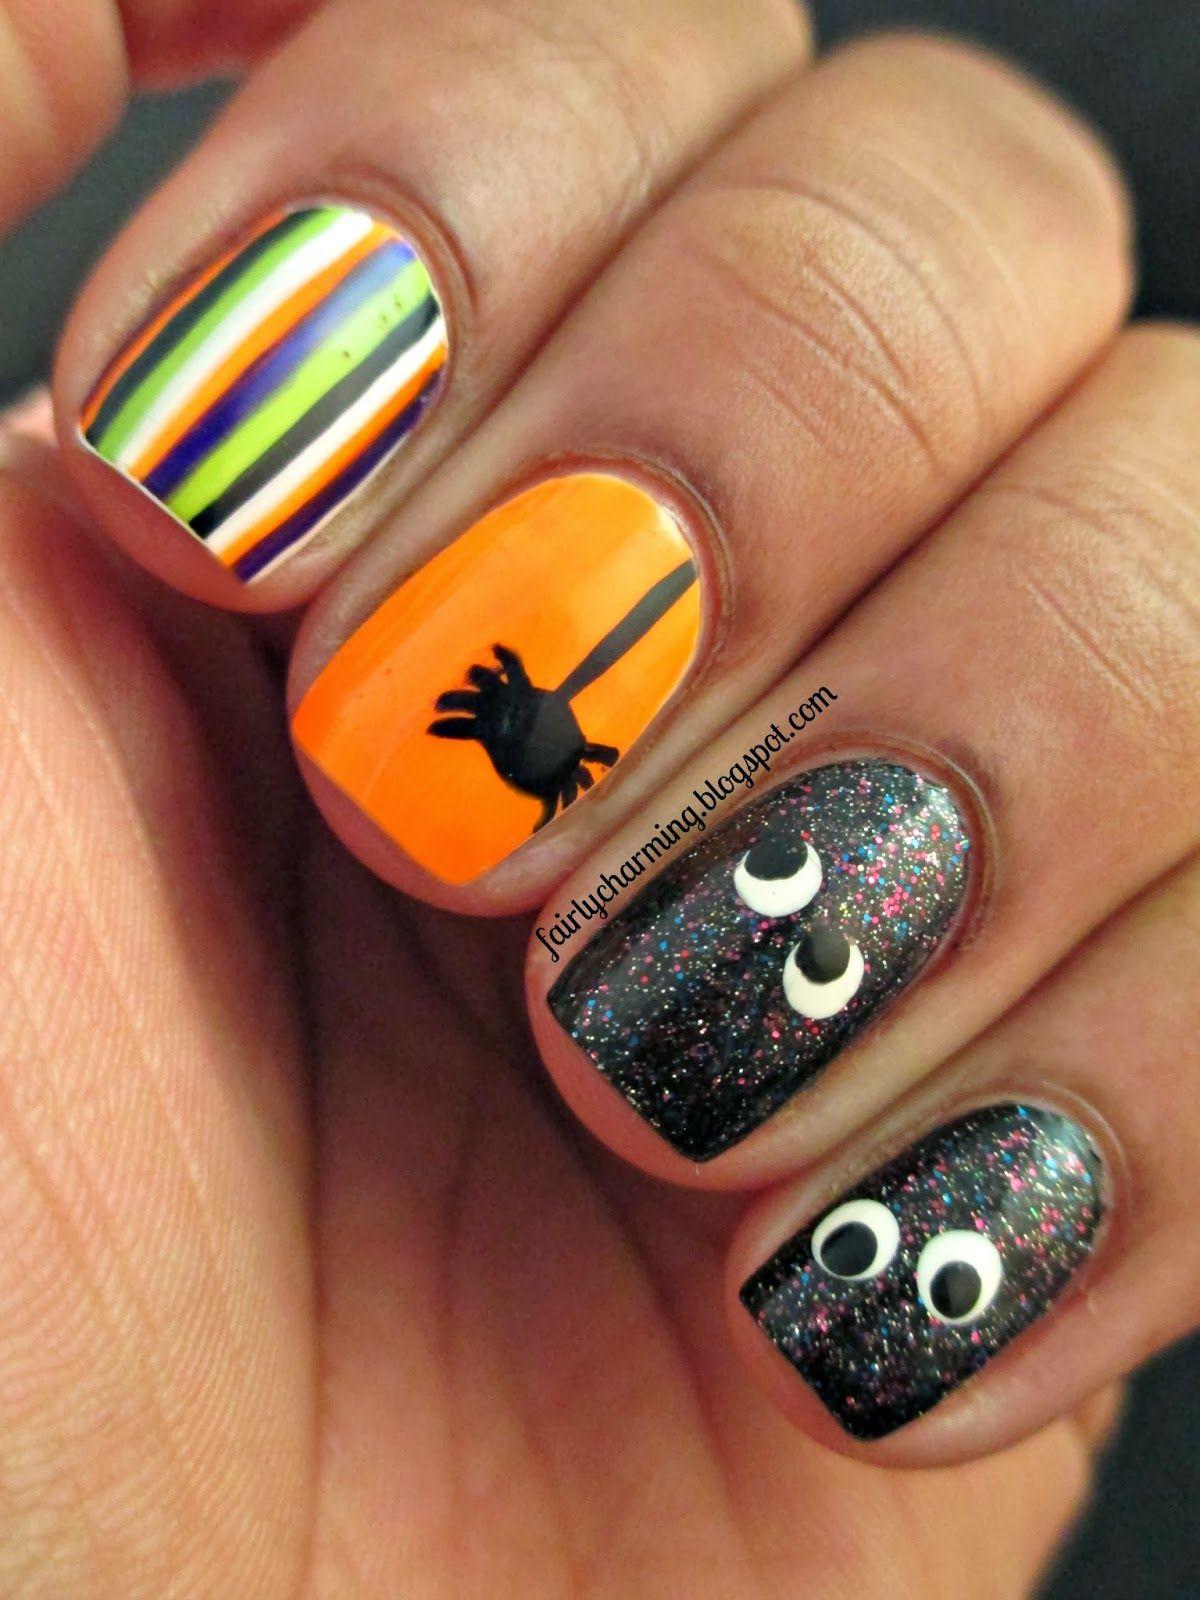 Pin By Amber Wenke On Nails Pinterest Nail Nail Makeup And